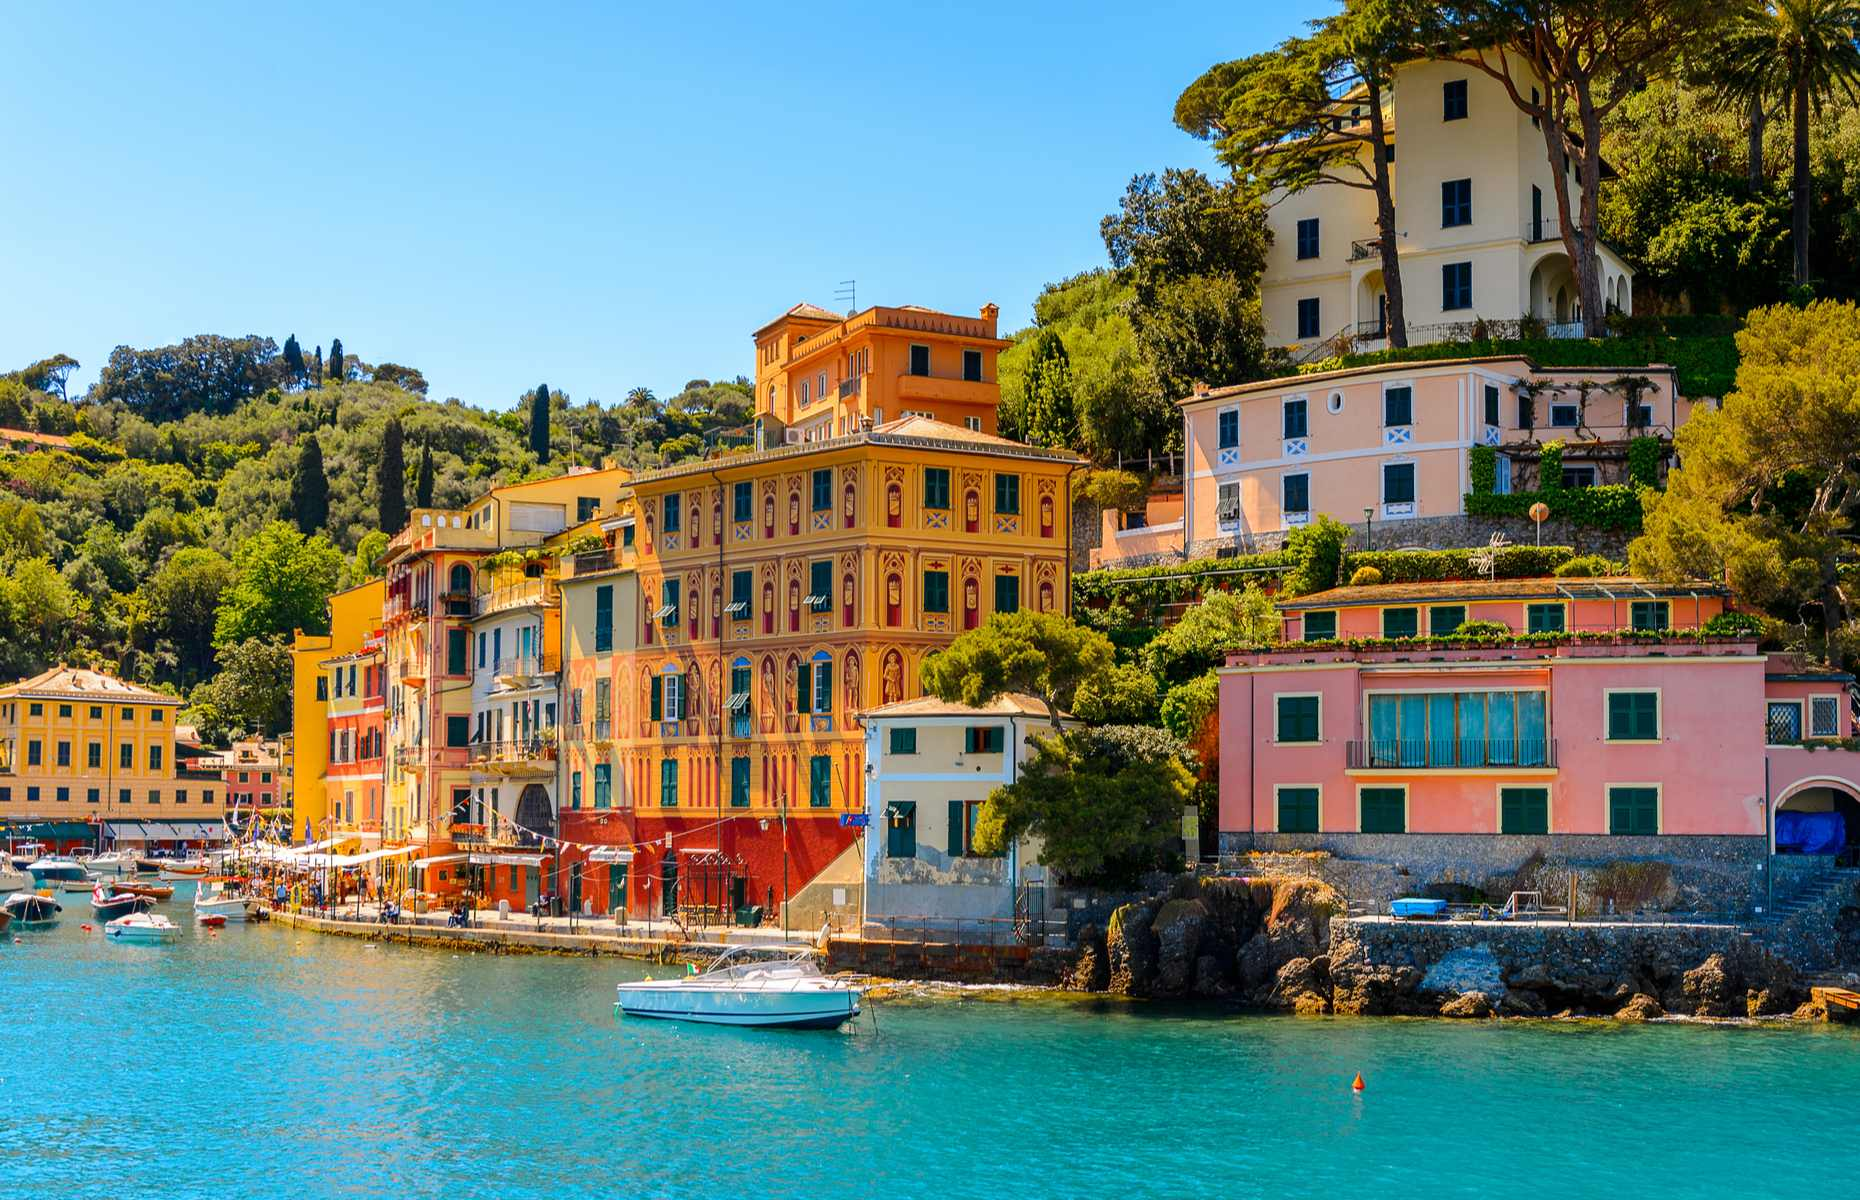 Portofino fishing village in Italy (image: Anton_Ivanov/Shutterstock)